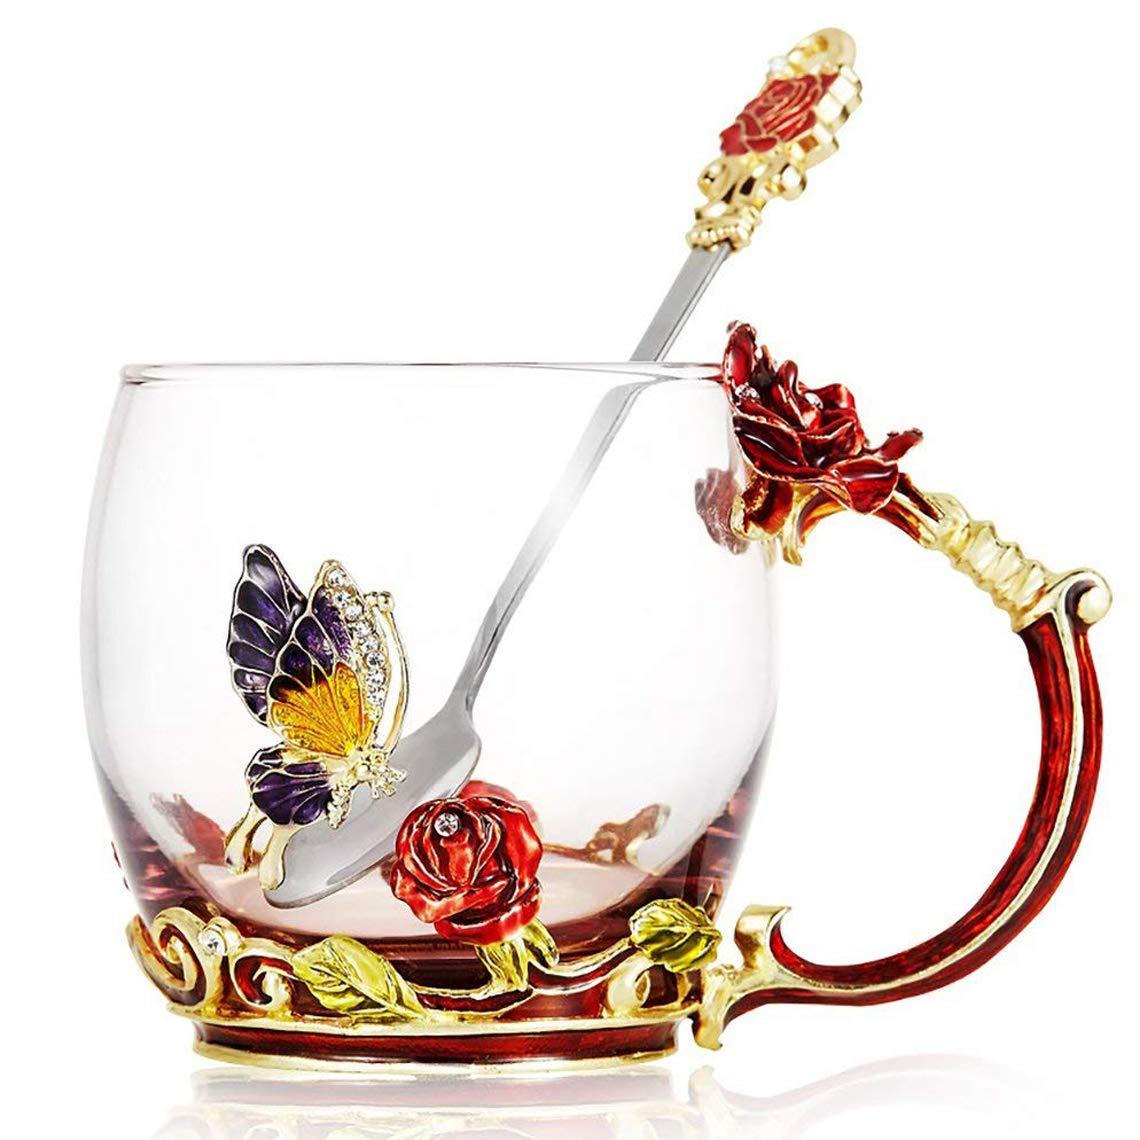 KKGO Tea Cups Coffee Mug with Spoon for Women Girls, Crystal Glass Unique Rose Flower Design Handmade Enamel Beautiful Tea Coffee Cup - Gift Set for Mom Grandma Wife Girlfriend Sisters Coworker JJLIFE GT-FLSS5087